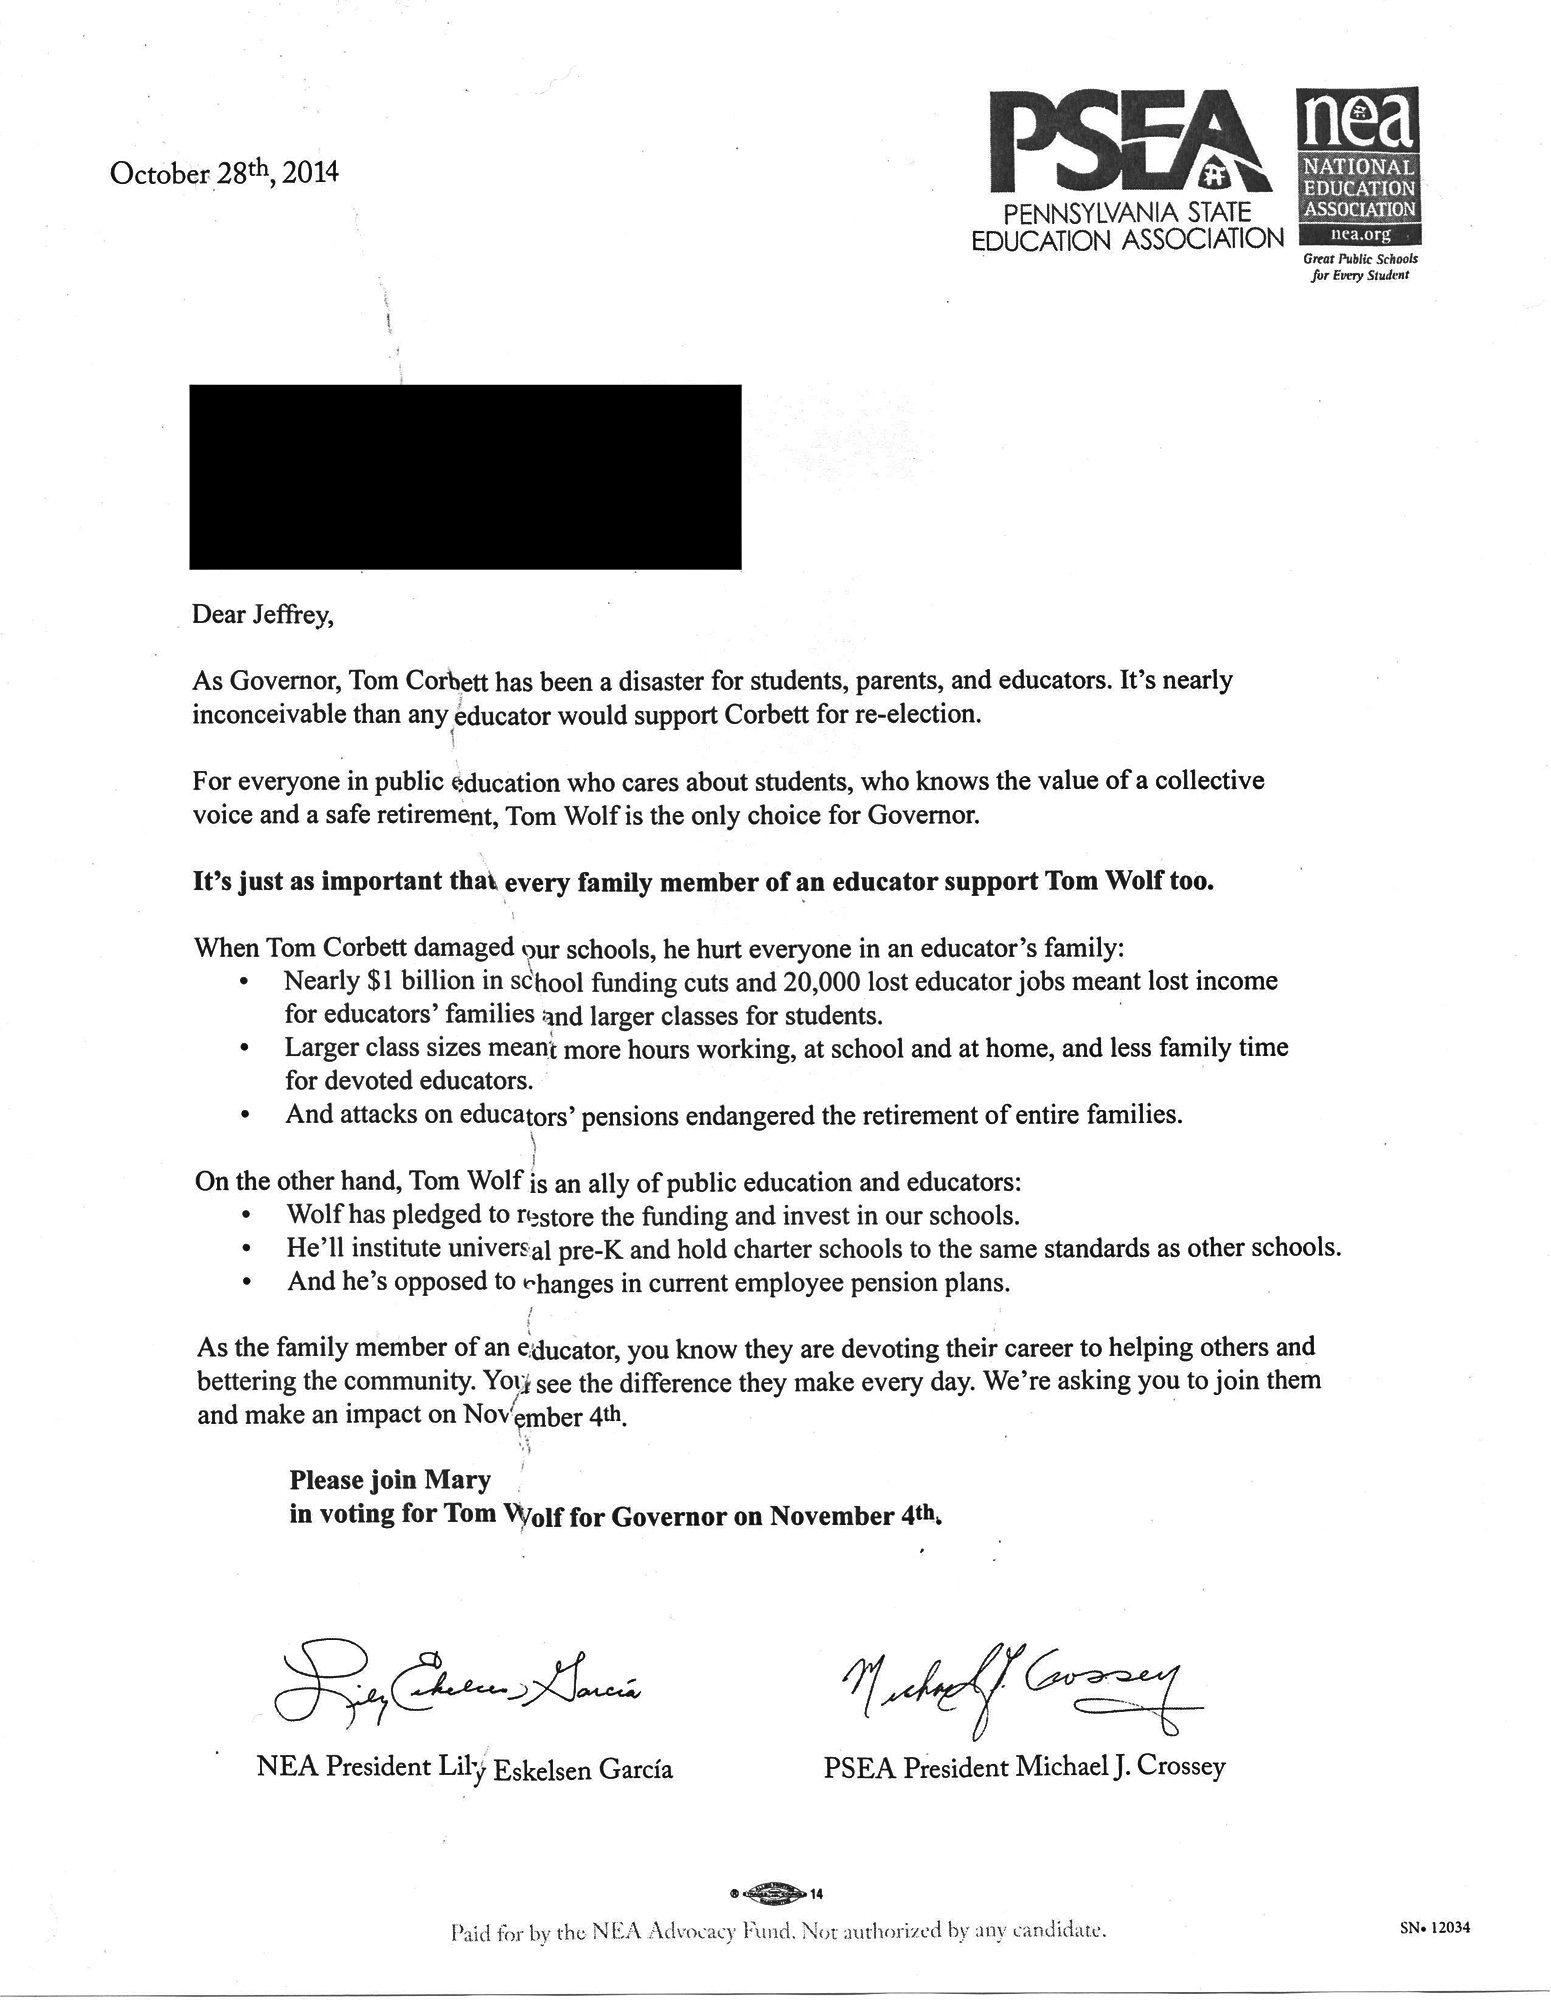 Teacher Files Complaint Against Unions Over Political